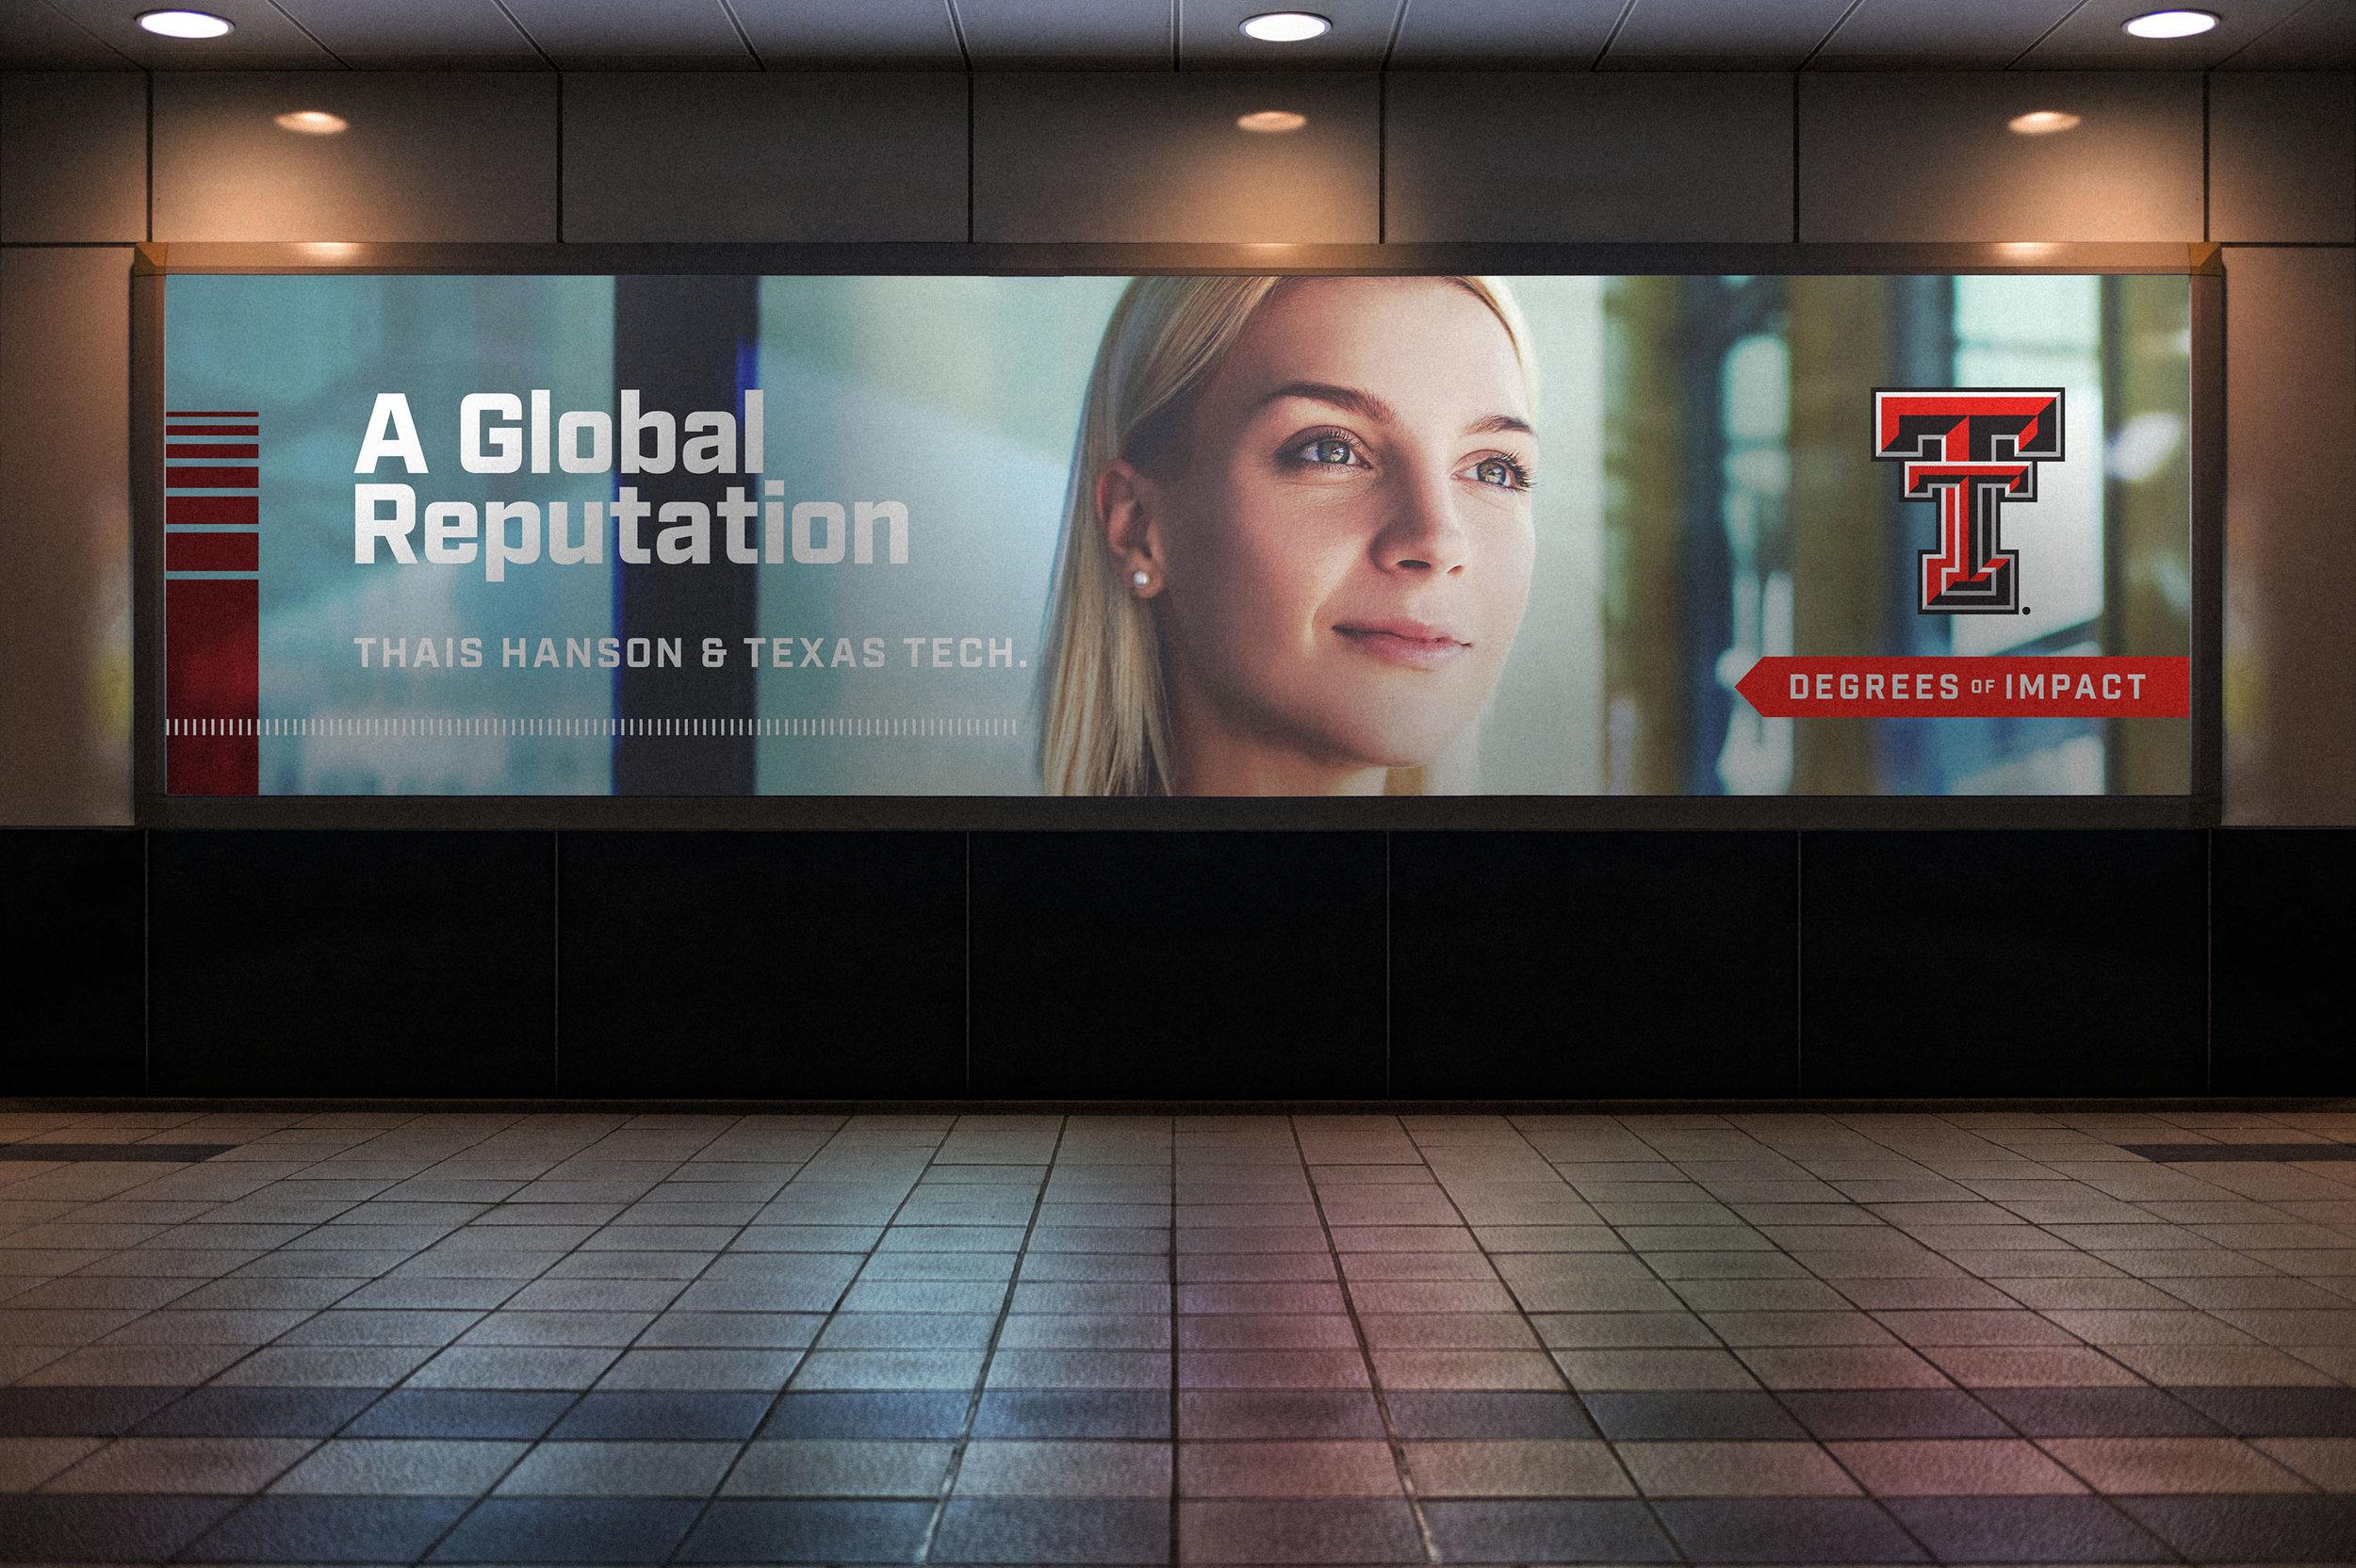 ronaldvillegas-degreesofimpact-billboard-thais-hanson.jpg